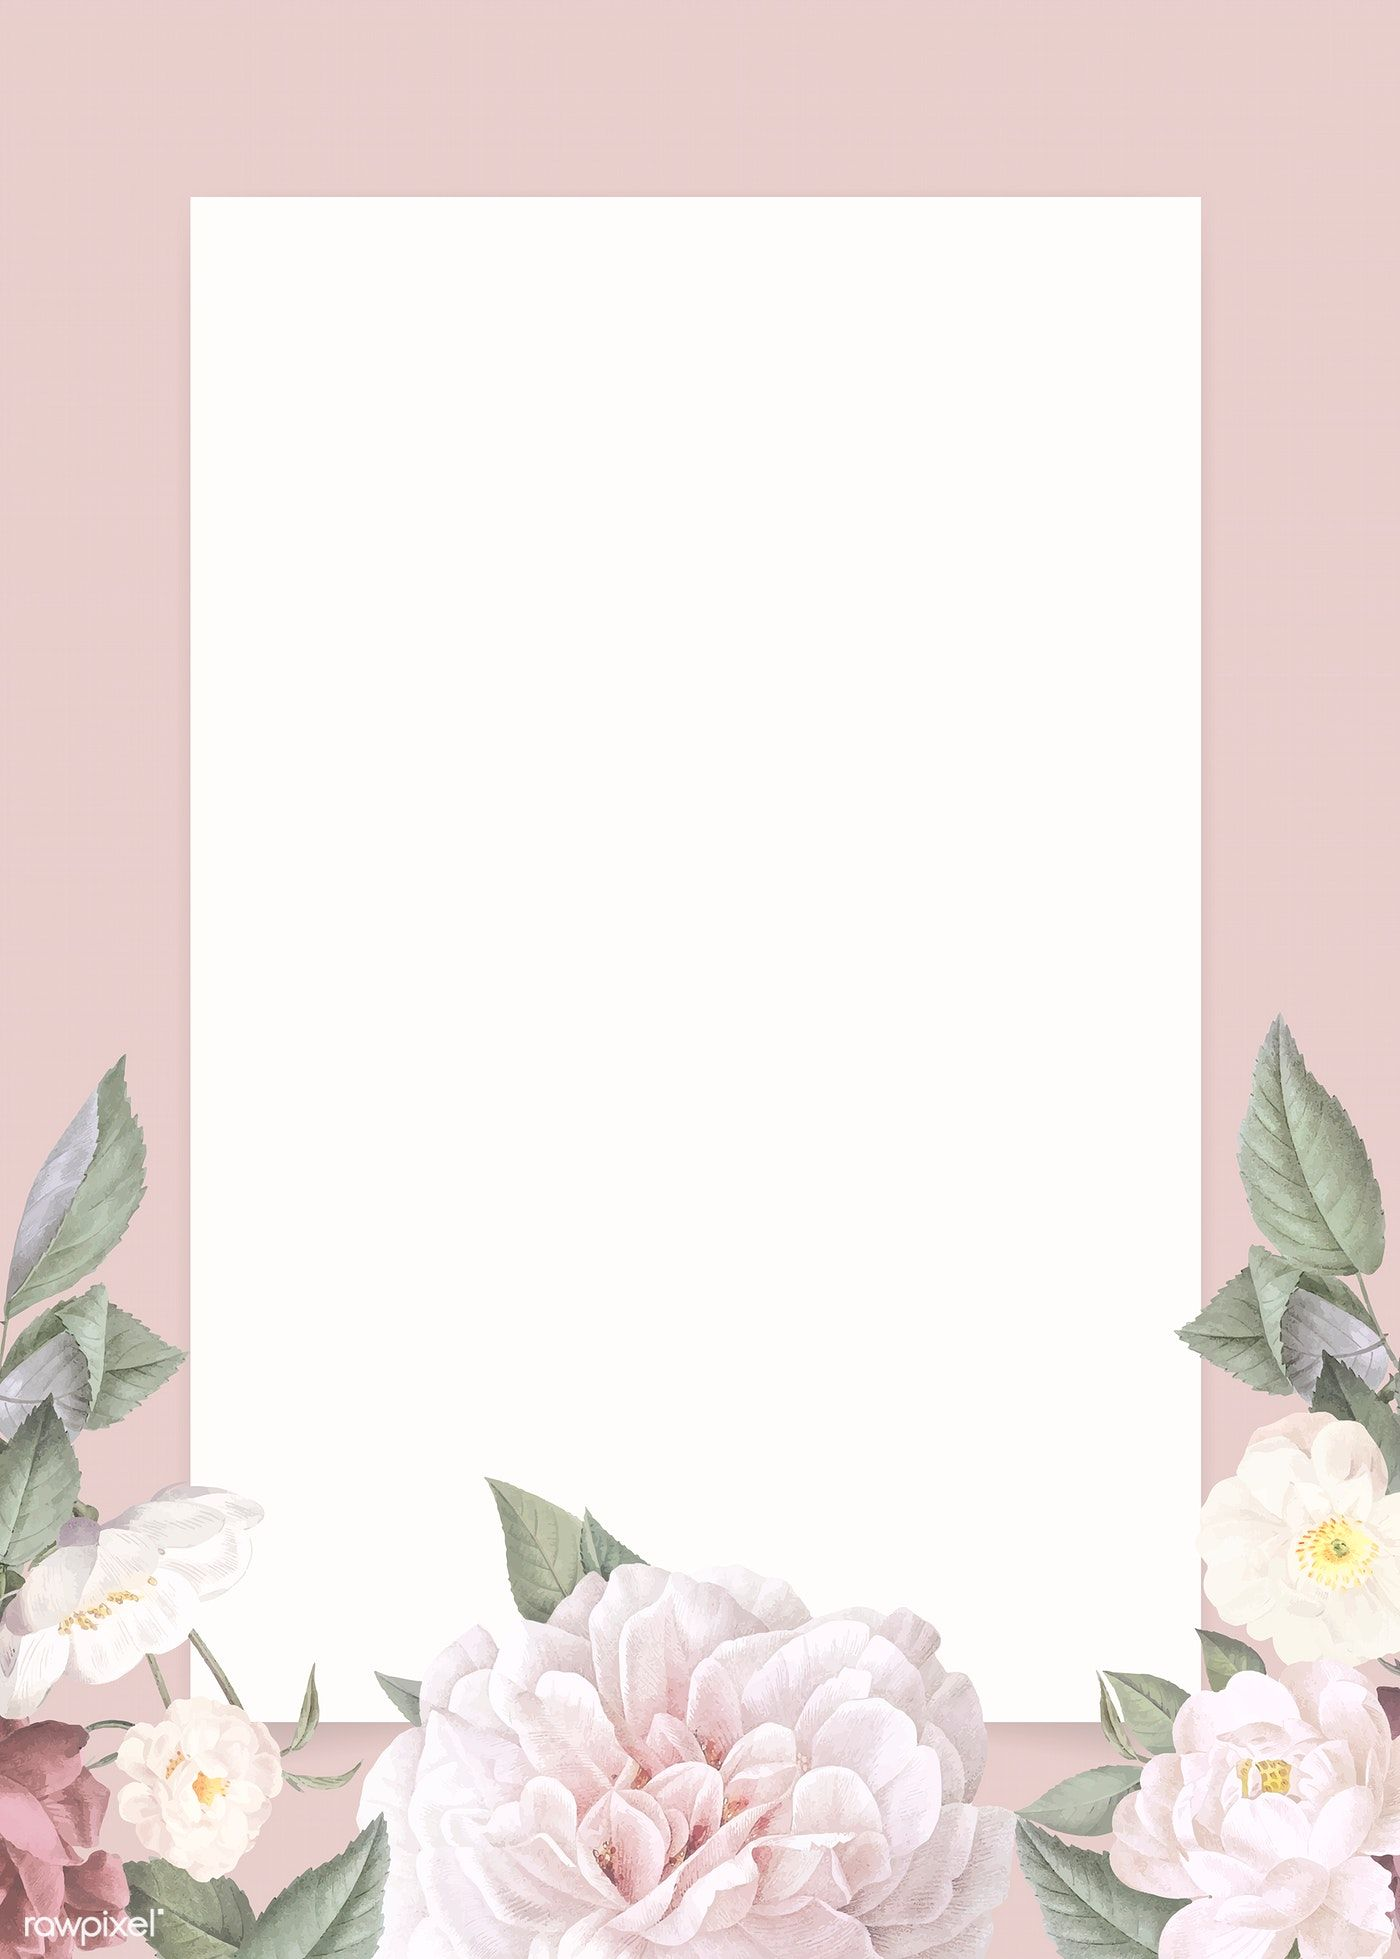 Floral Pattern. Wallpaper Baroque, Damask. Seamless Vector